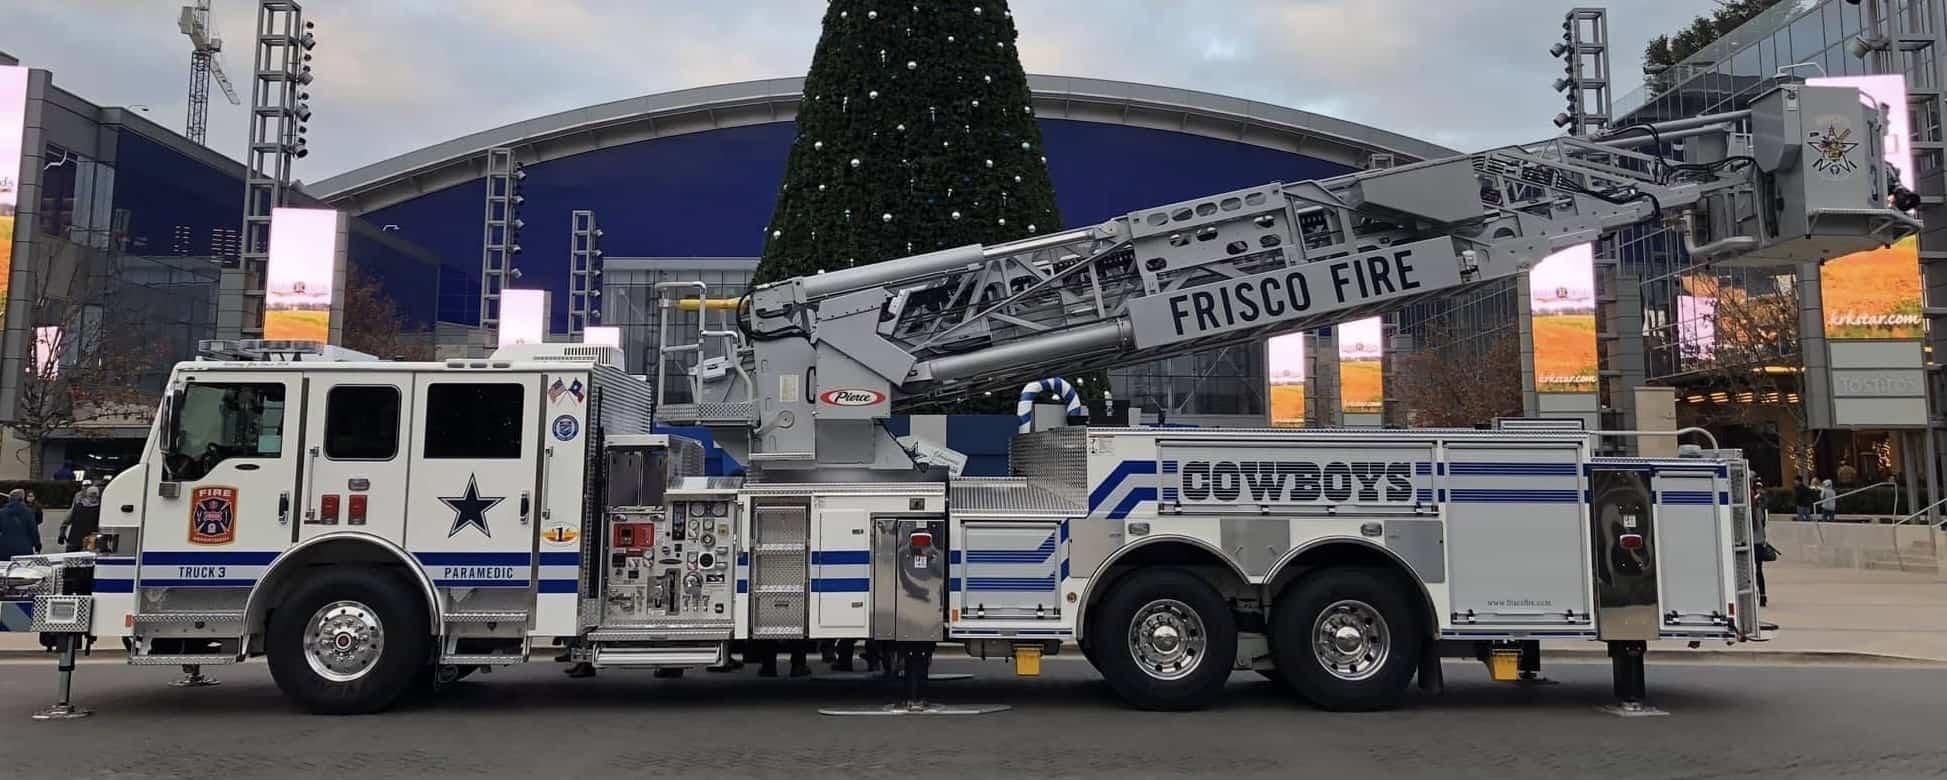 Frisco Fire Department Dallas Cowboys Truck